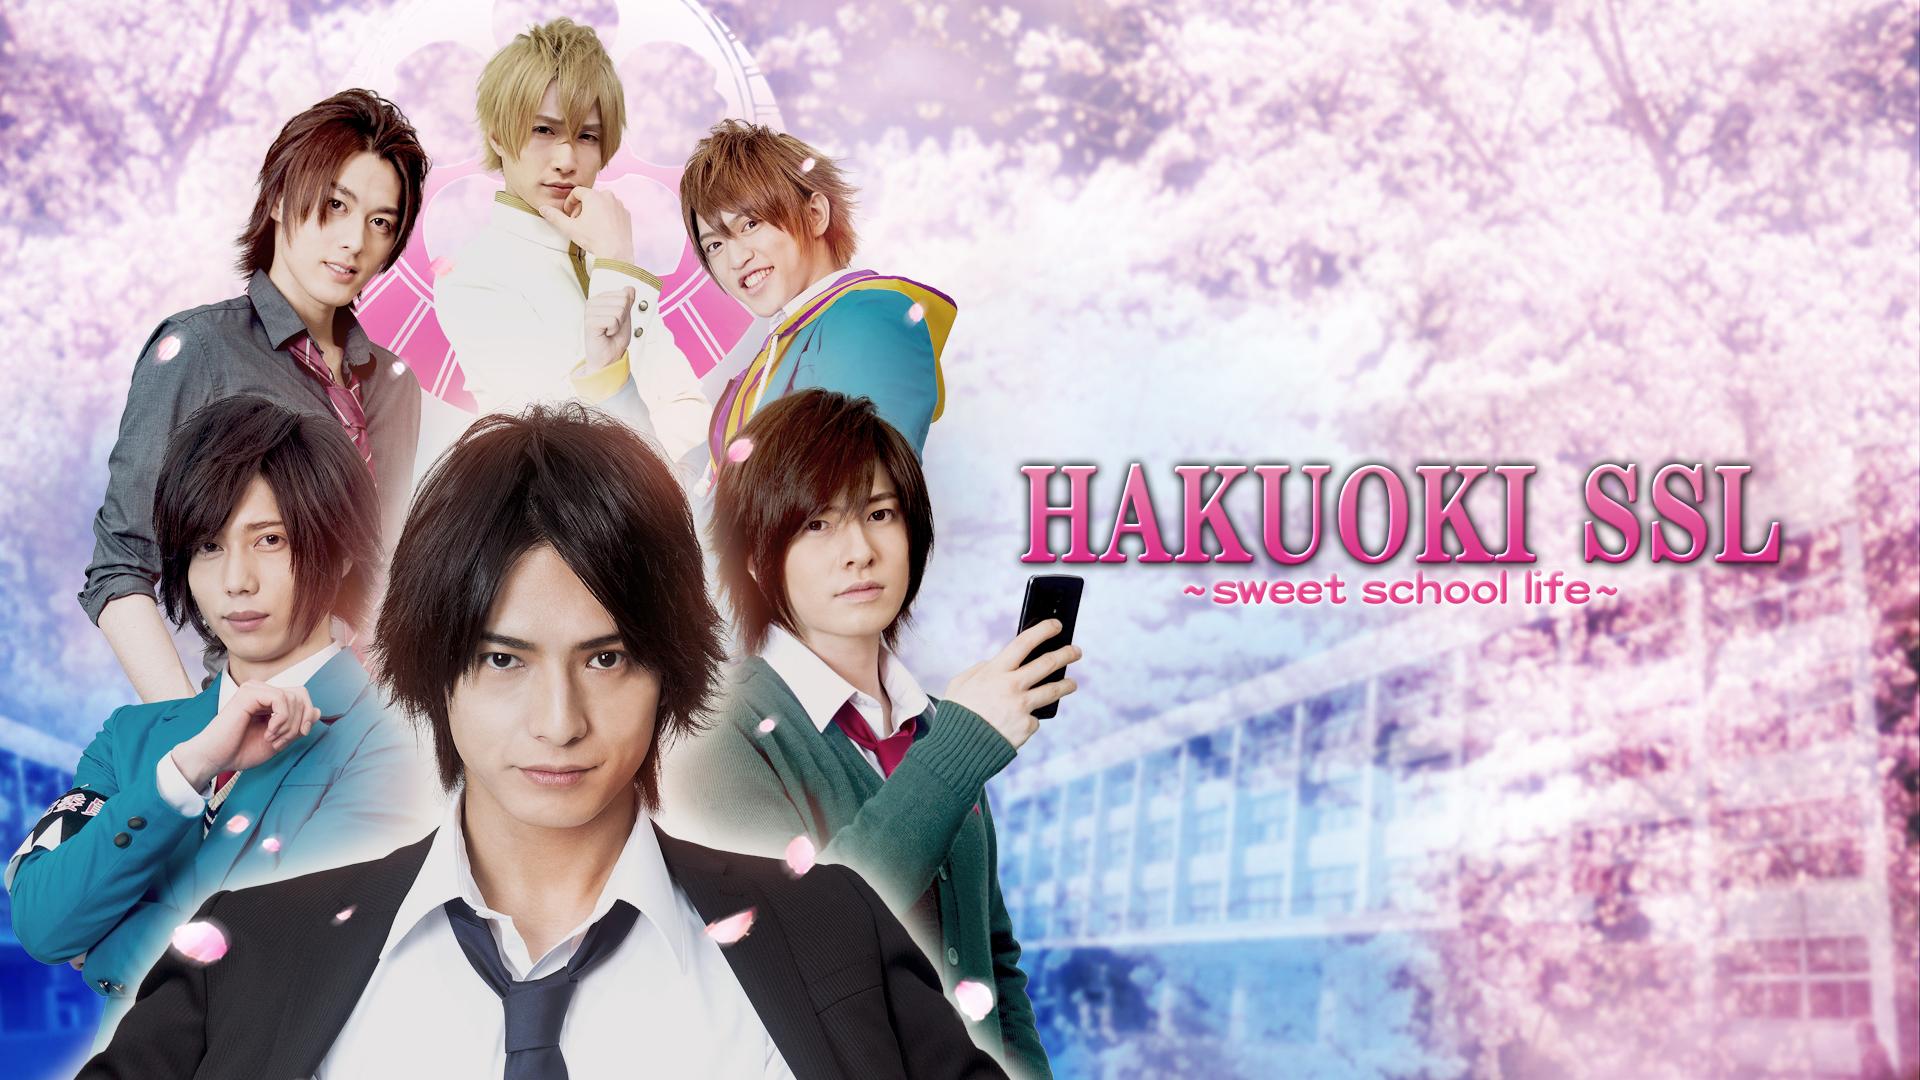 Hakuoki SSL-sweet school life-